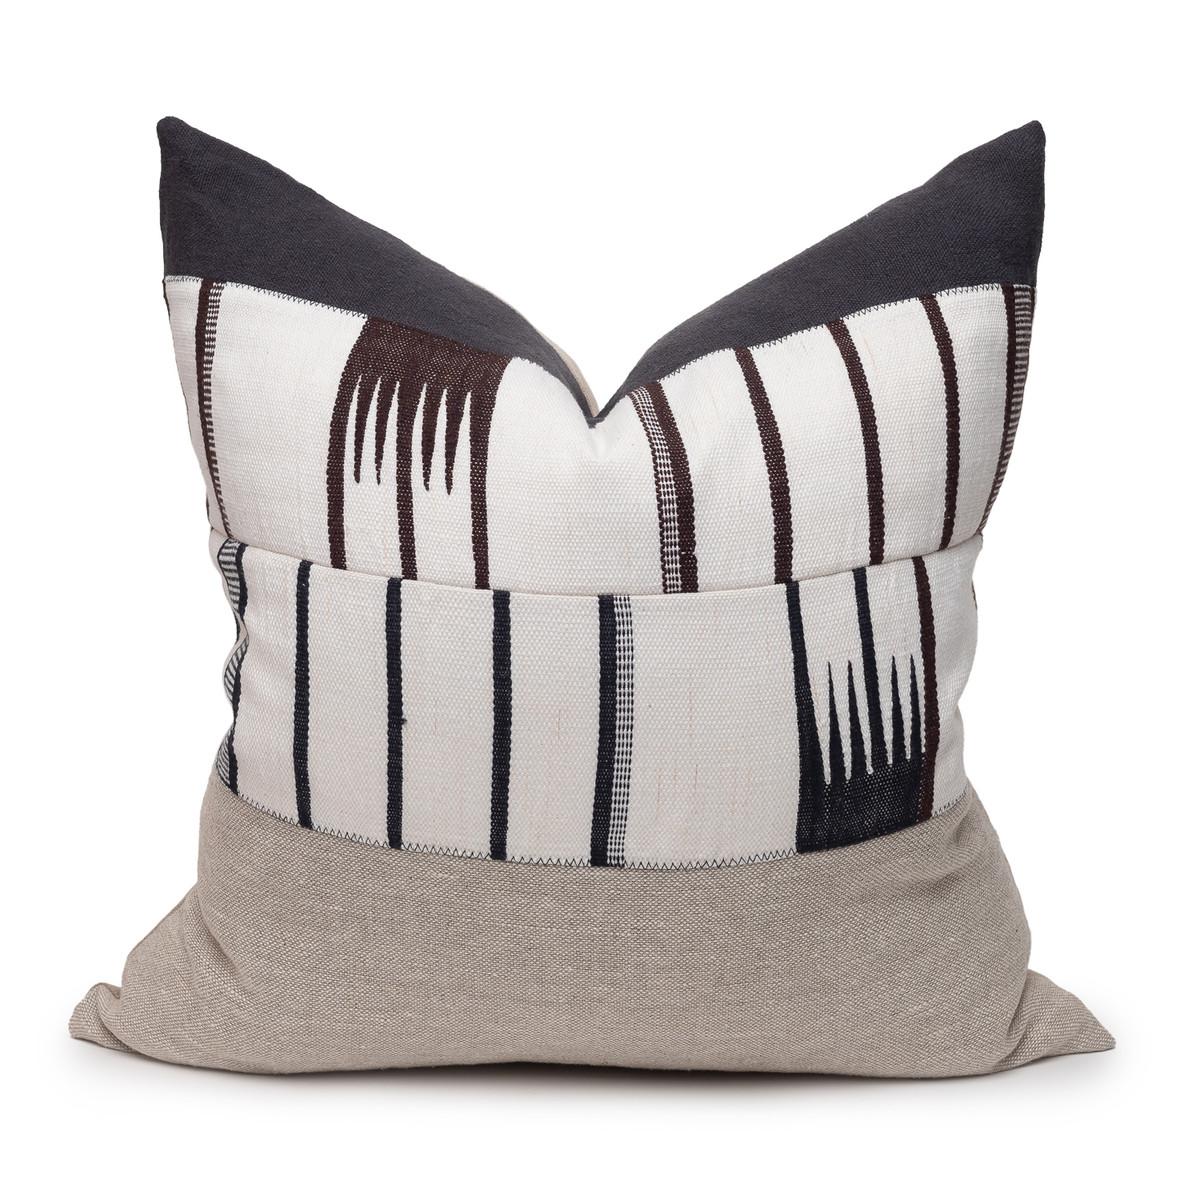 Galaxy Linen Aso Oke Luxe Vintage Pillow - Noir - 22 - Front